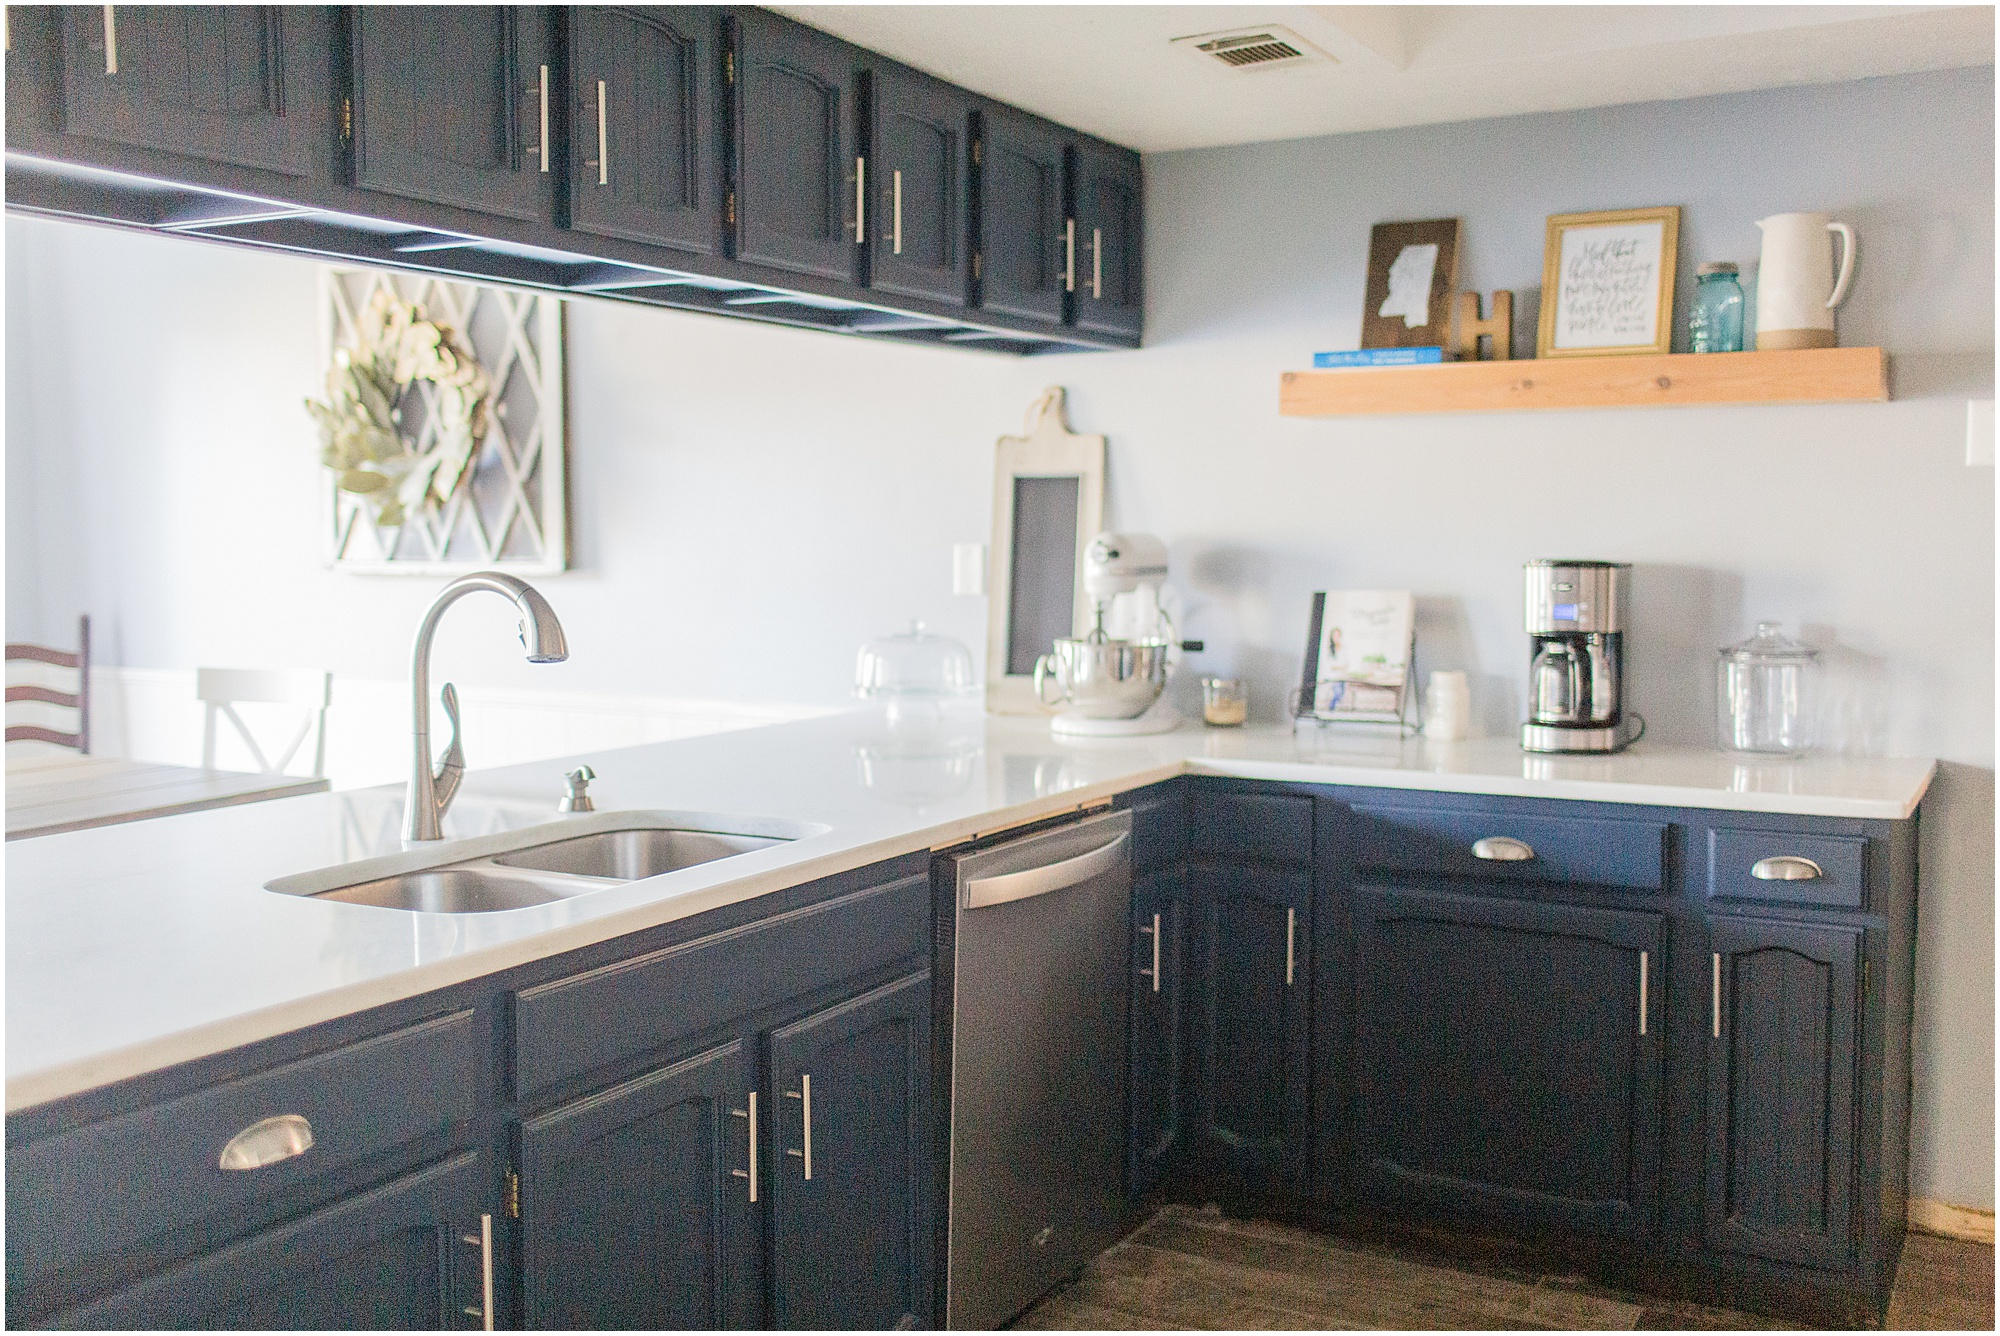 hambick-house-kitchen-renovation-fixer-upper_0009.jpg